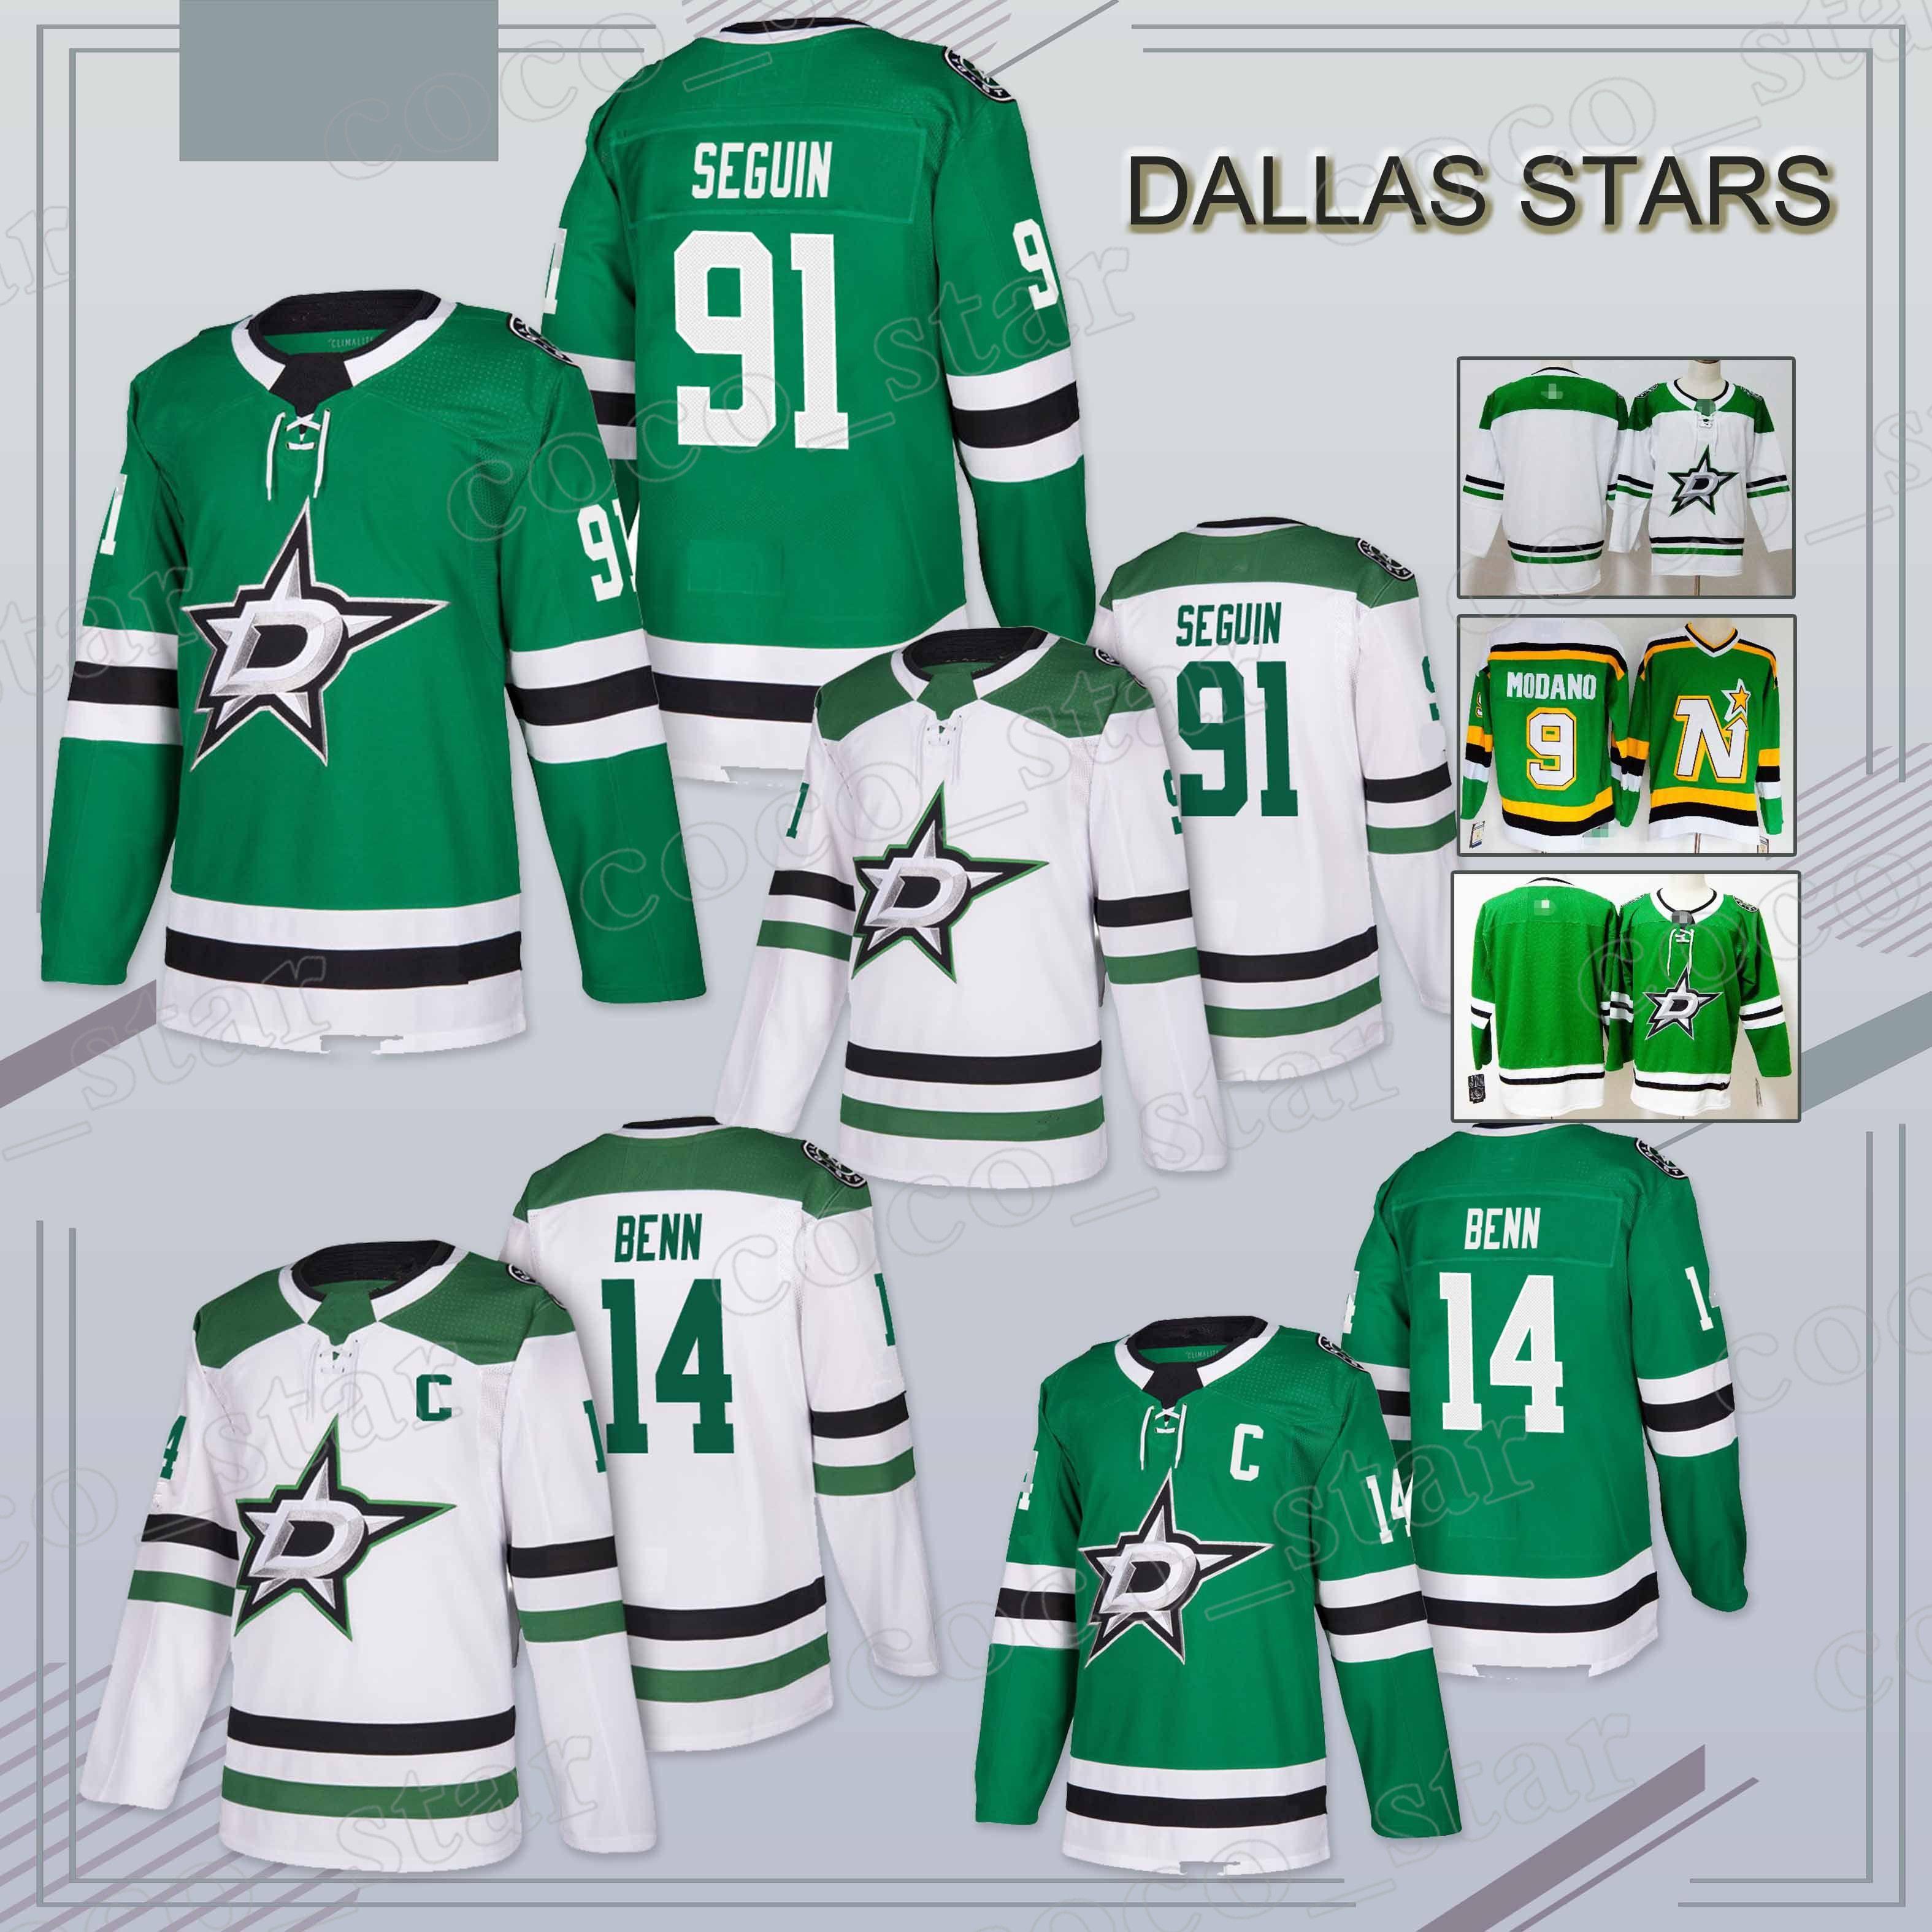 online store 129ef 8c74c hot 91 tyler seguin jersey for sale 71406 570dc